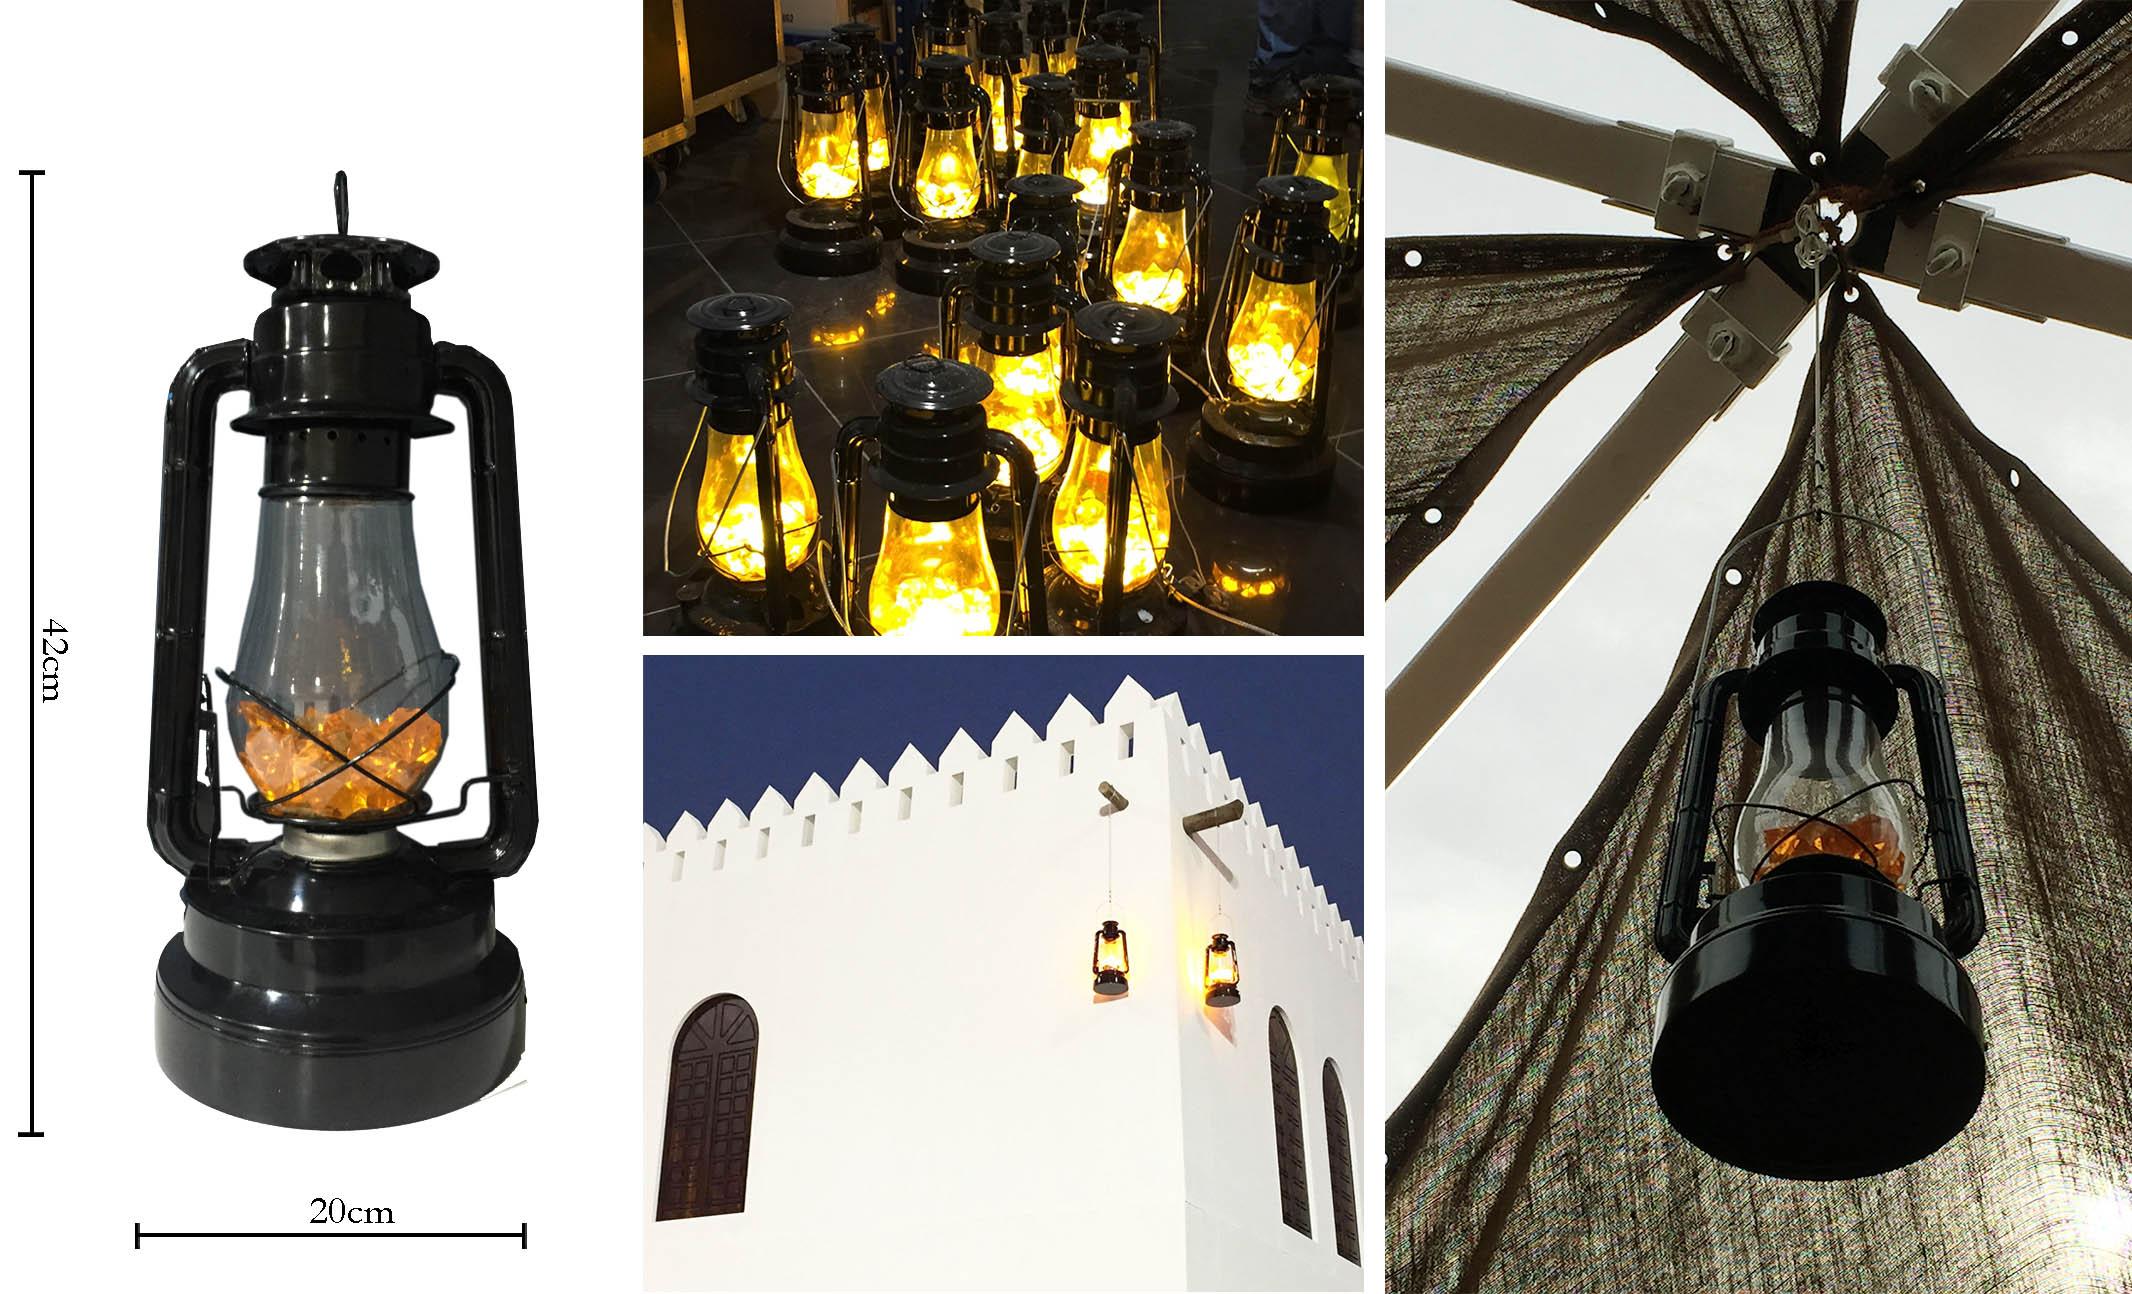 UAE Lanterns for Rent - Battery